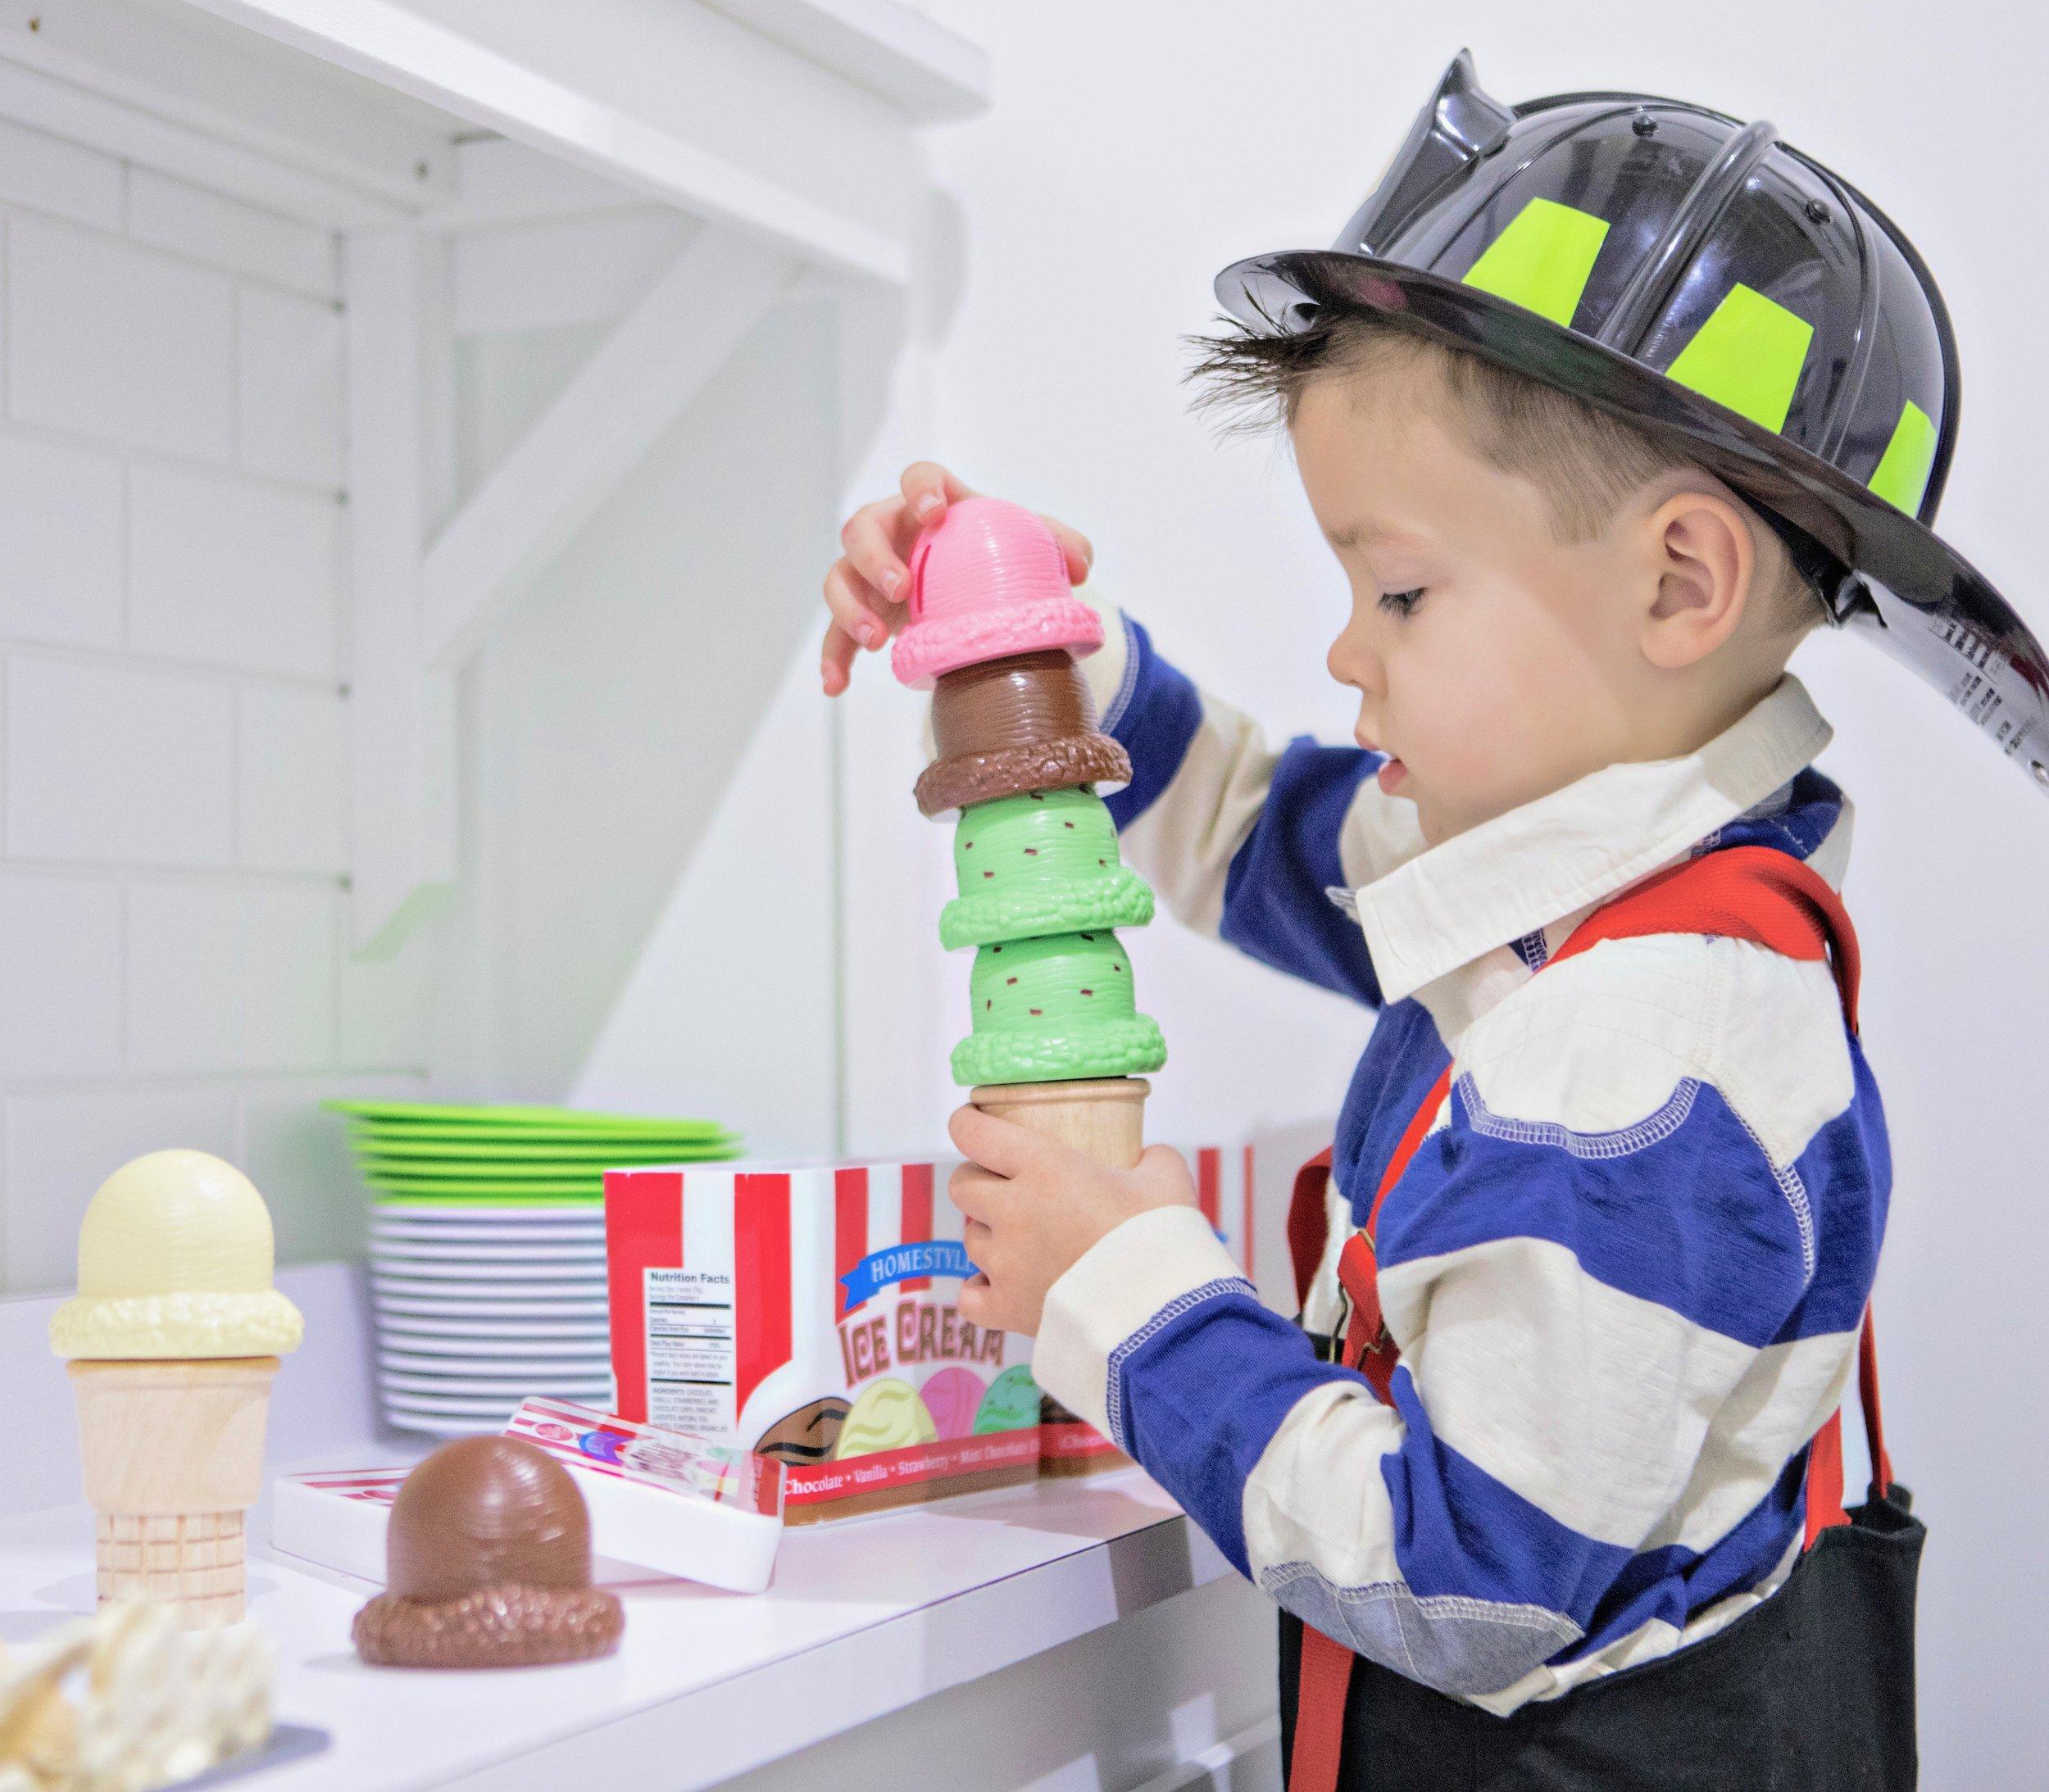 fireman icecream stl.jpg